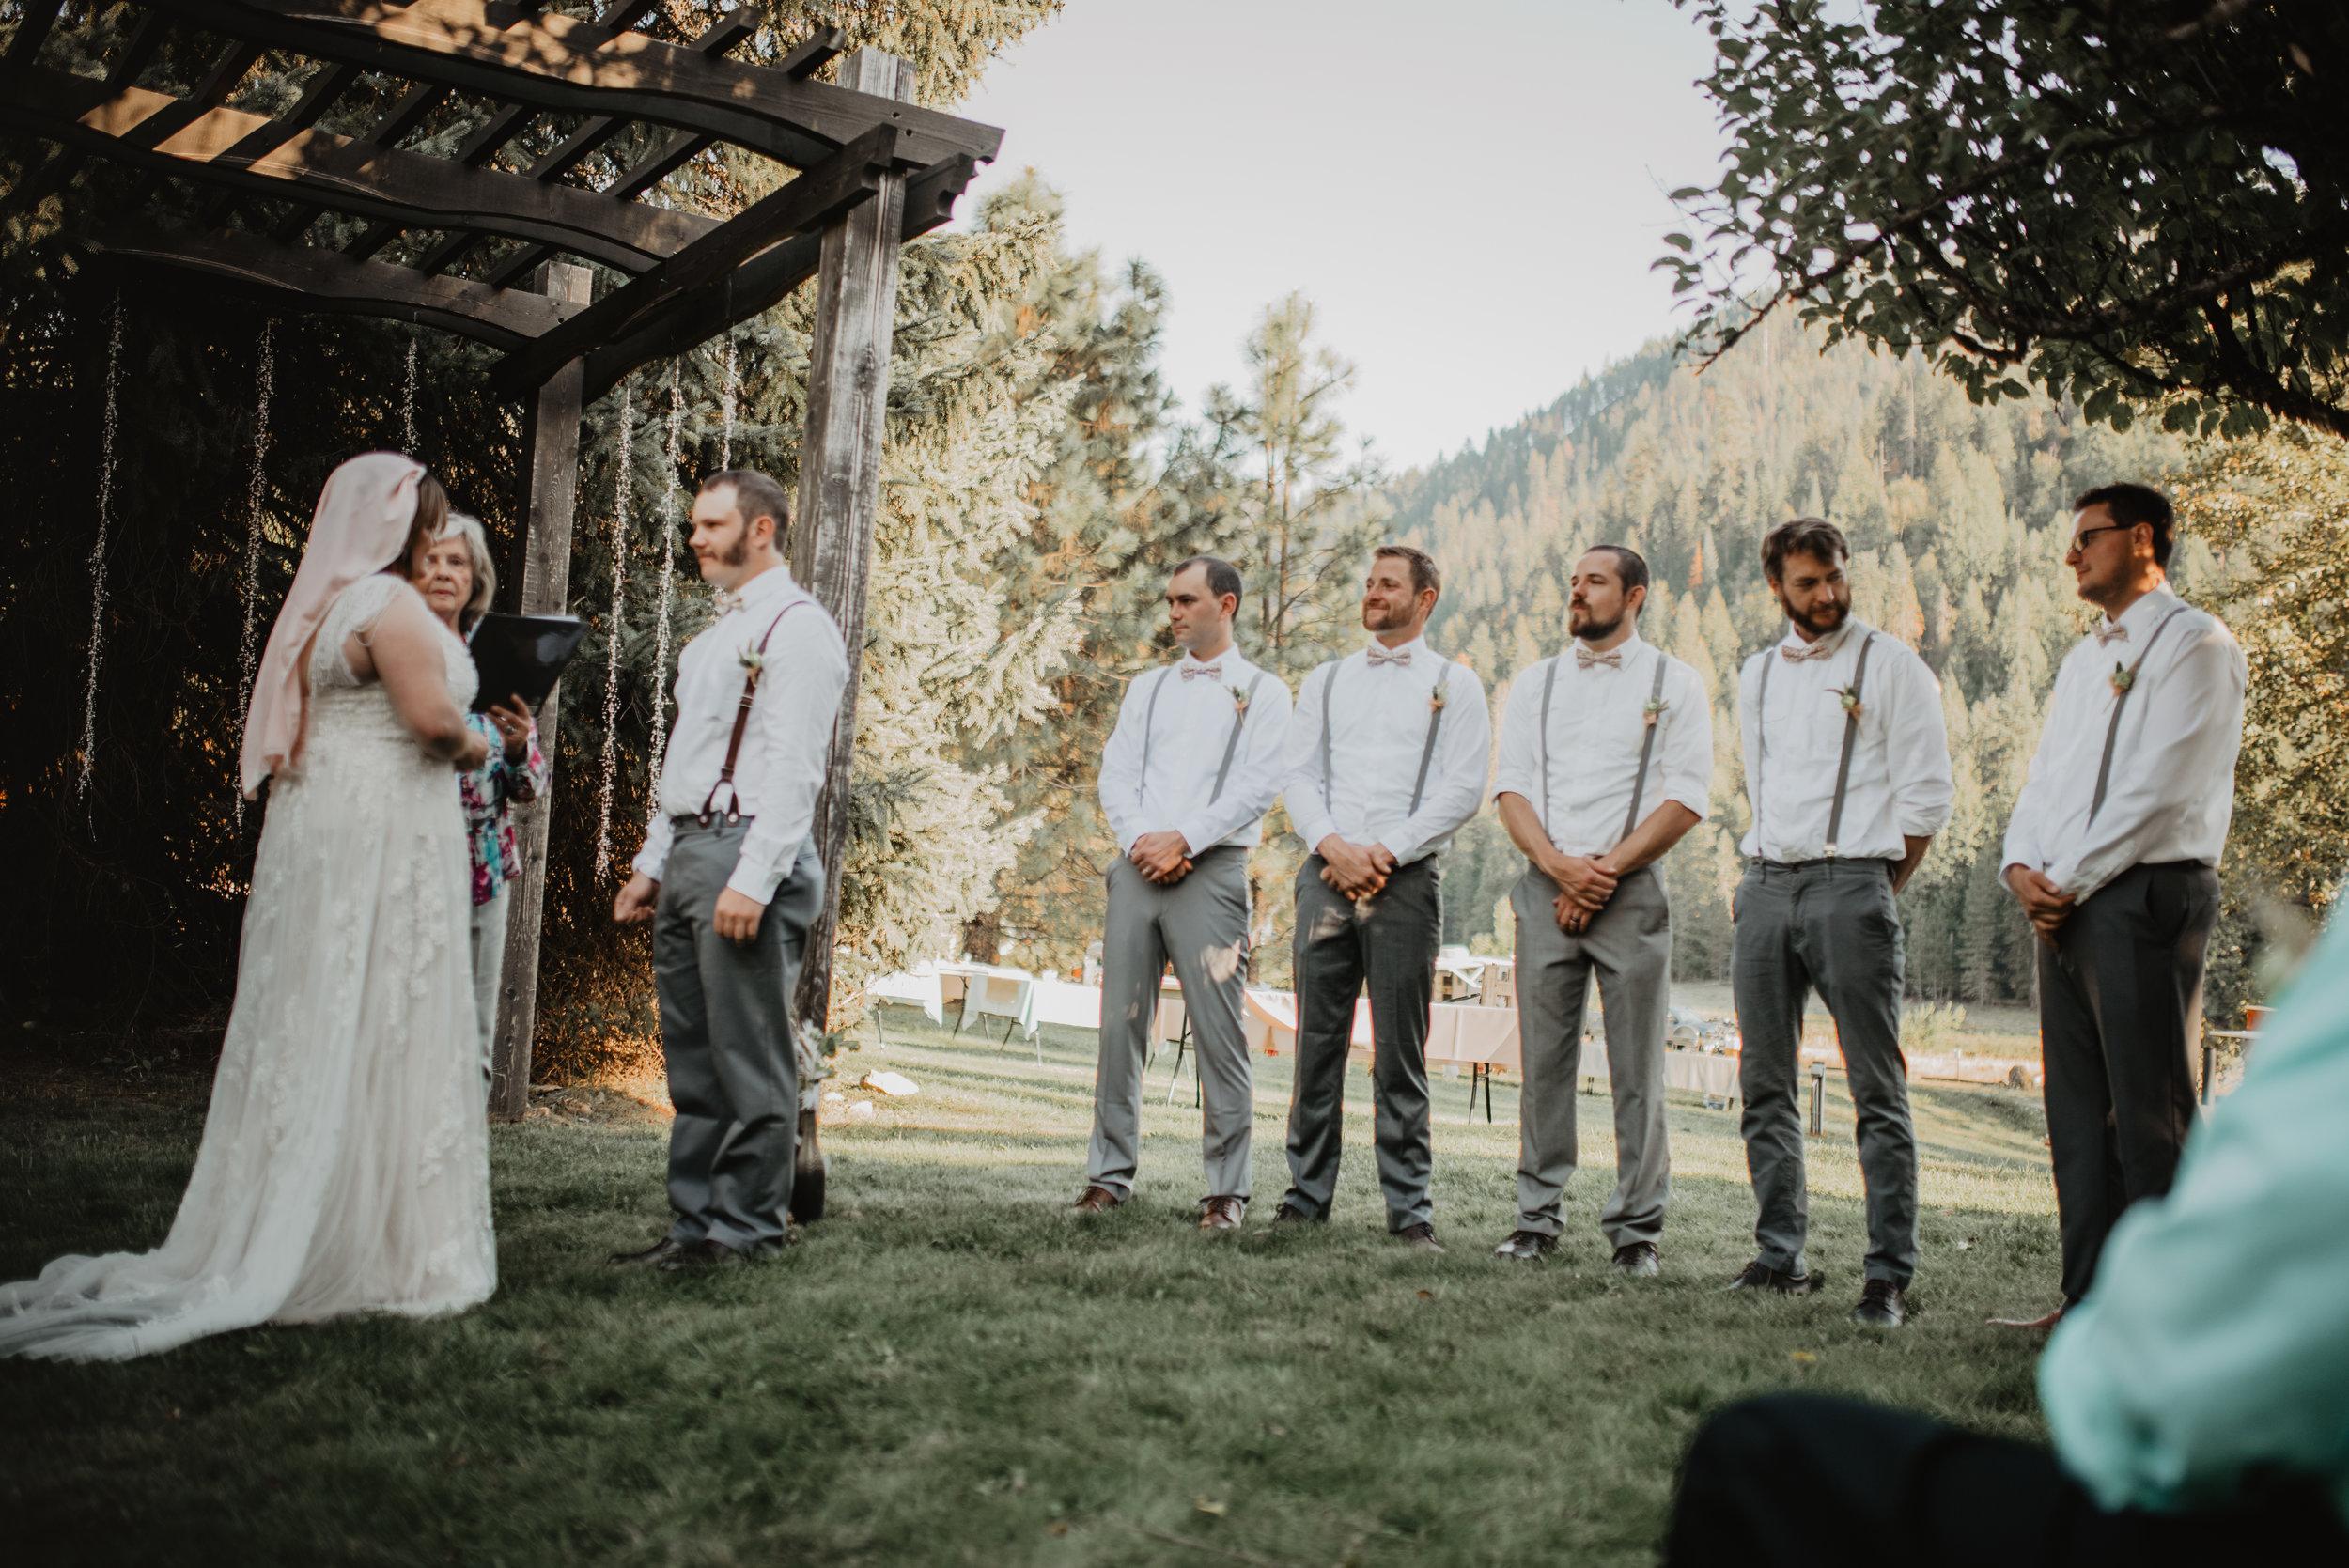 CT Wedding_Ceremony-33.jpg